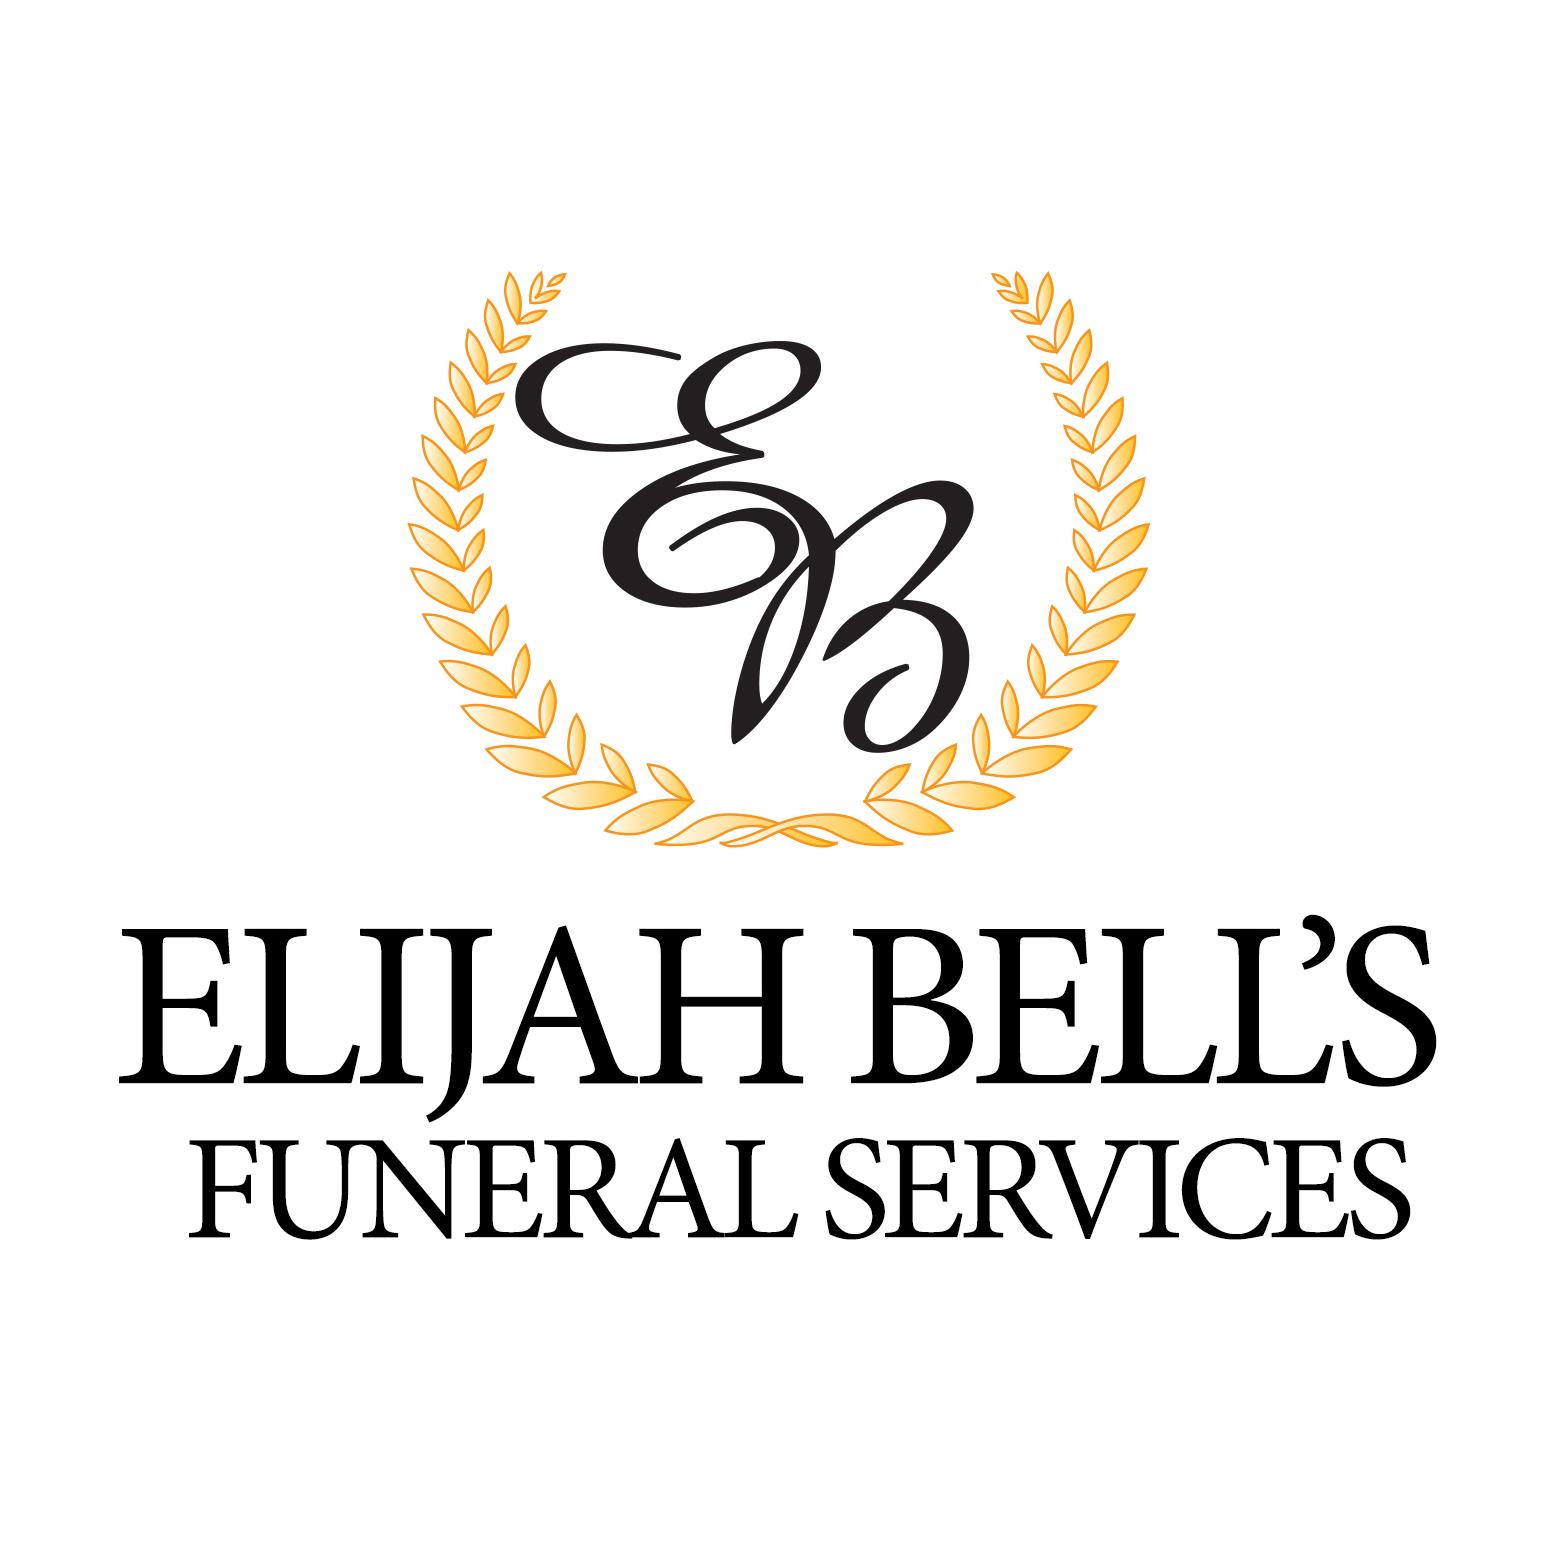 Elijah Bells Funeral Services - ad image